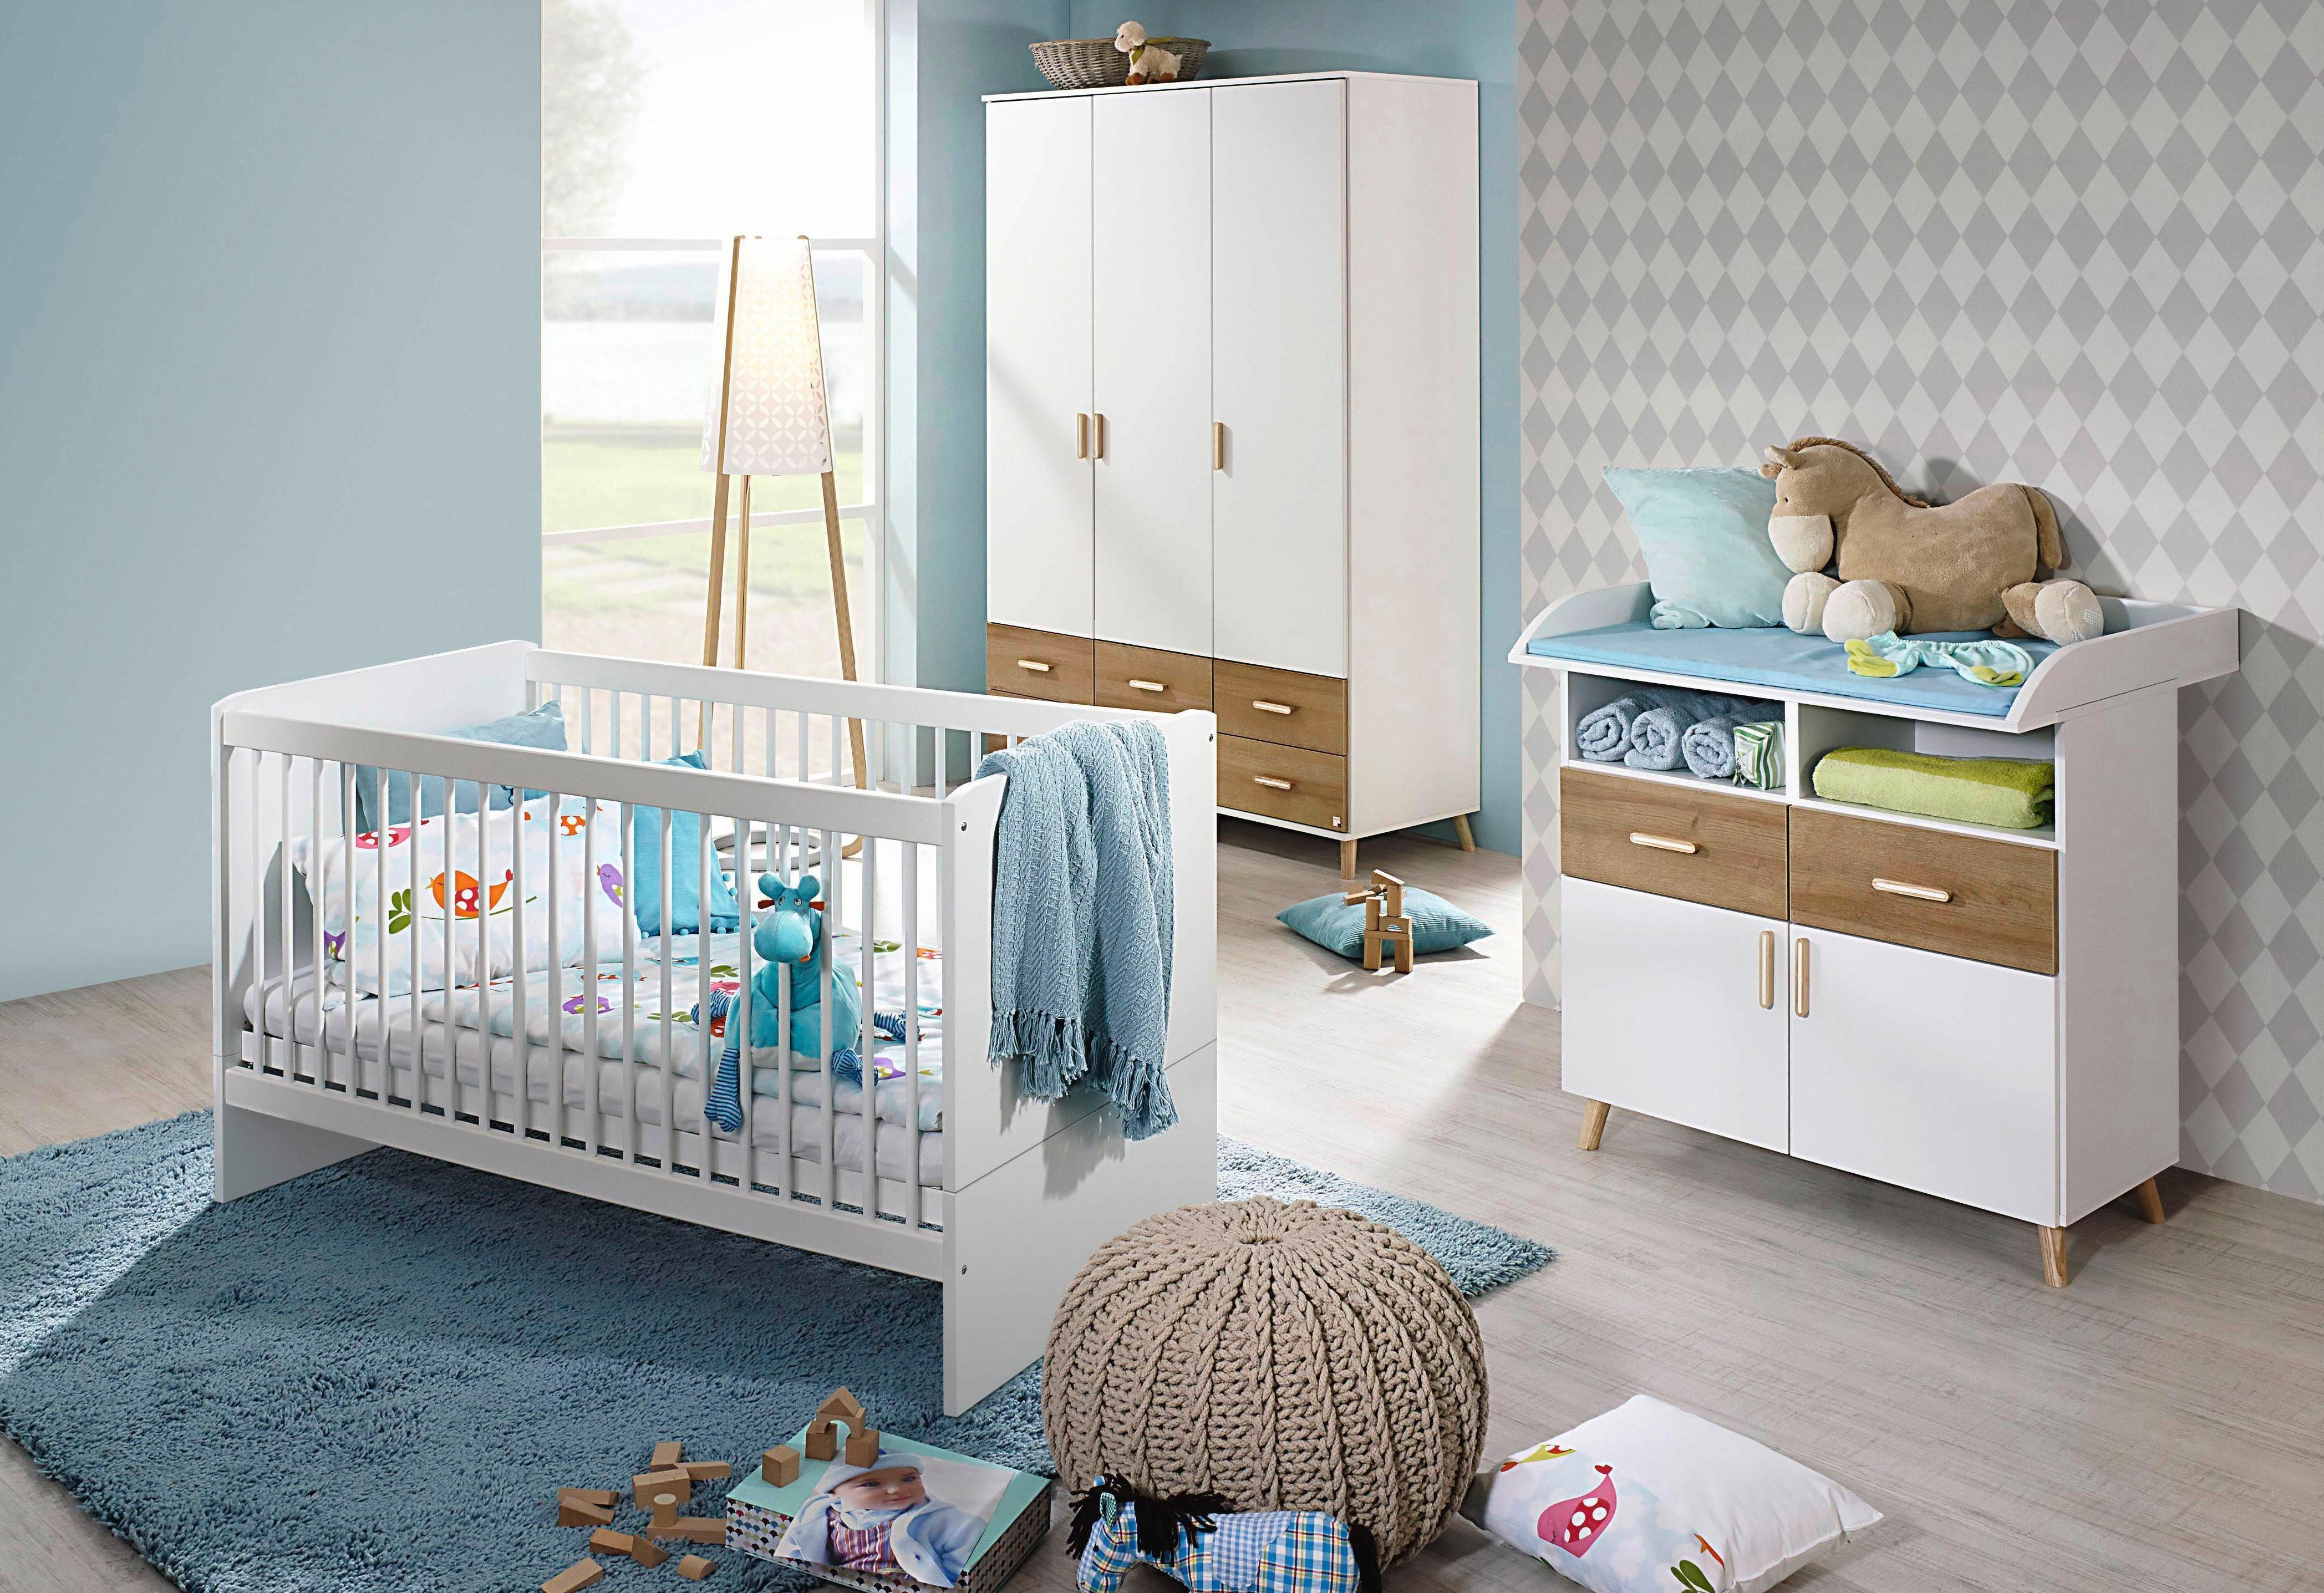 Babykamer Miami Kinderkamer : Babykamer potsdam eiken wit kopen bekijk de collectie otto